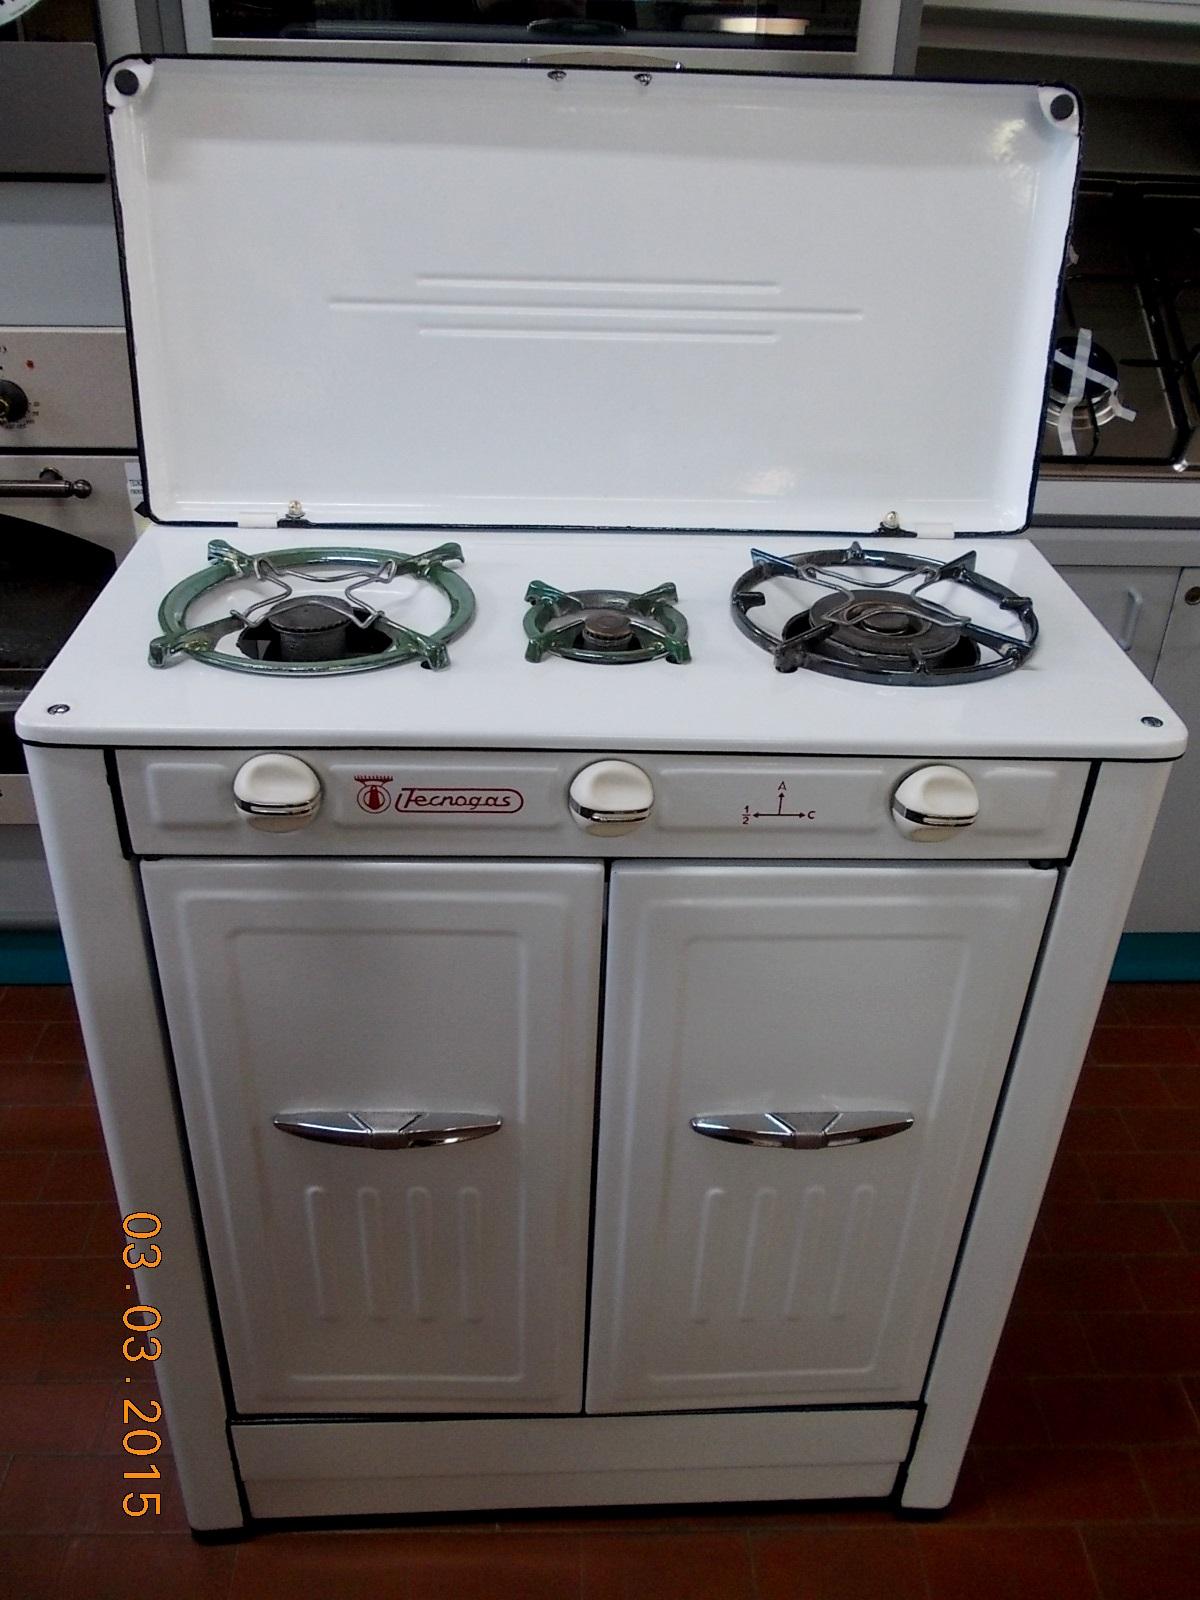 Mobili moderni bagno for Mobili cucine a gas